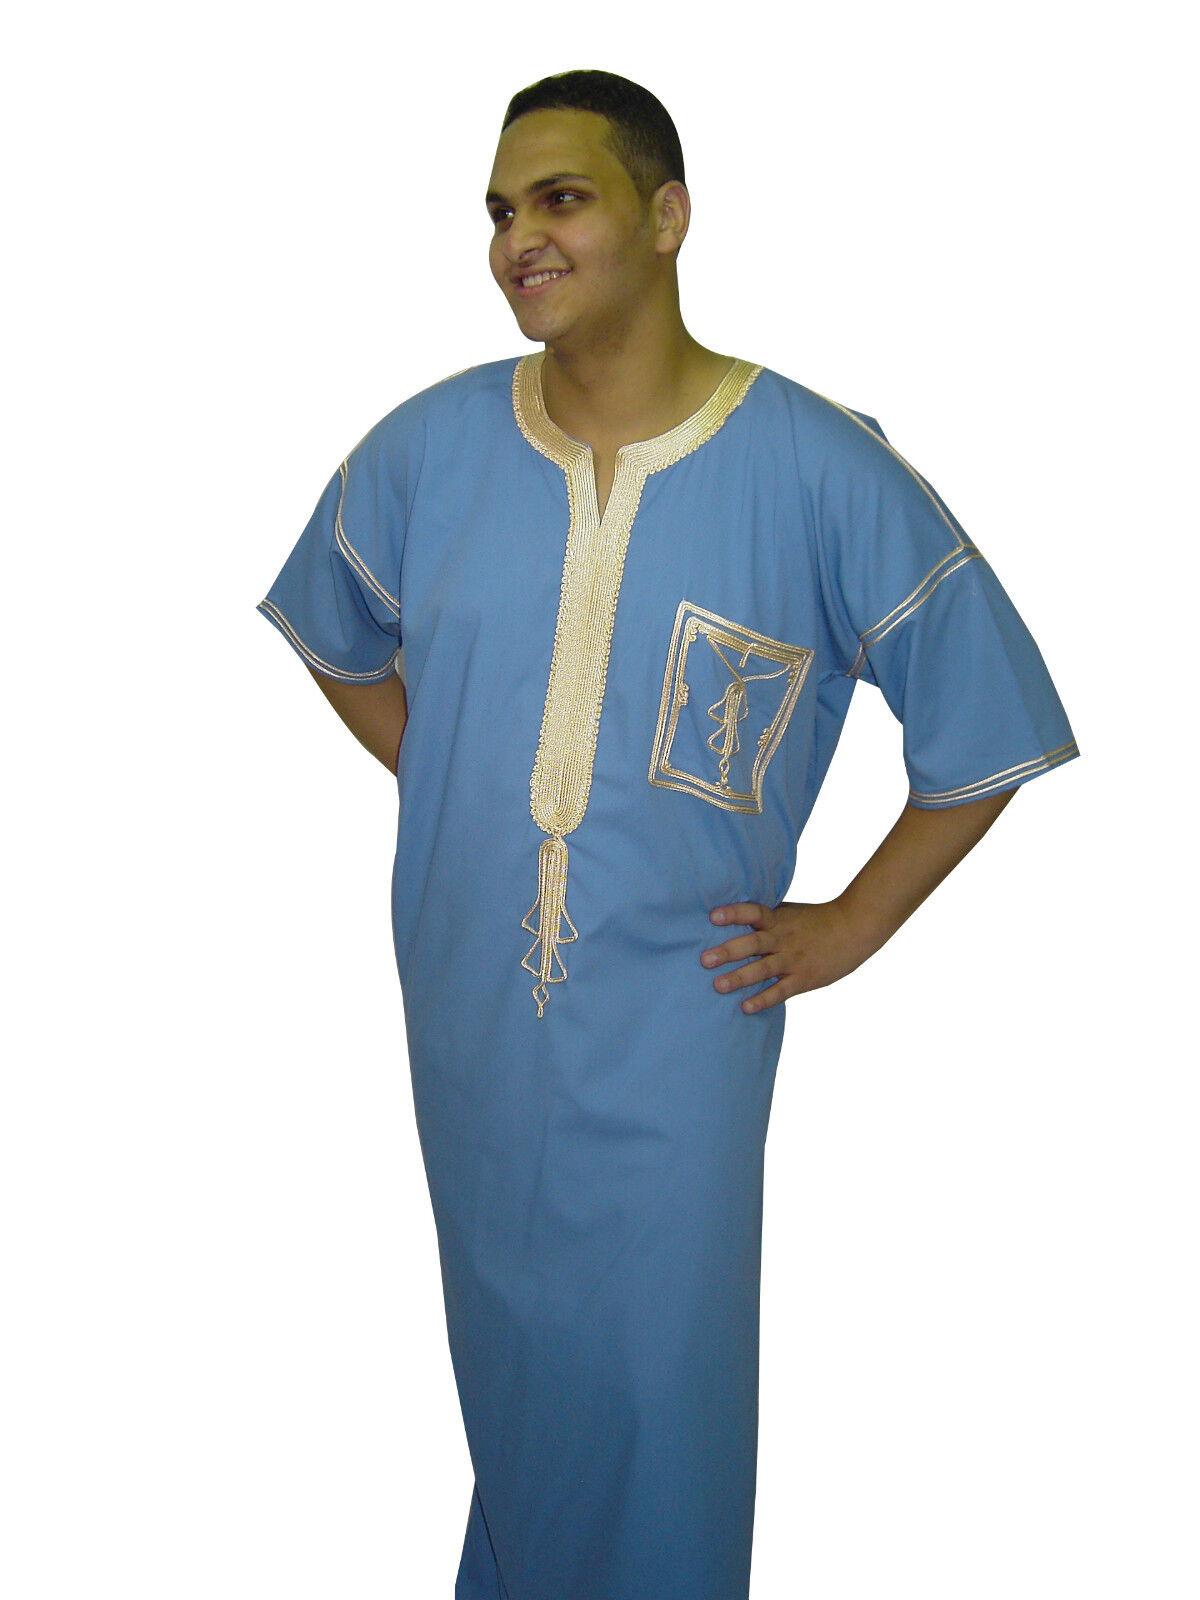 Caftan Tunic Dress Housedress Arab Sheikh Costume Dress 586